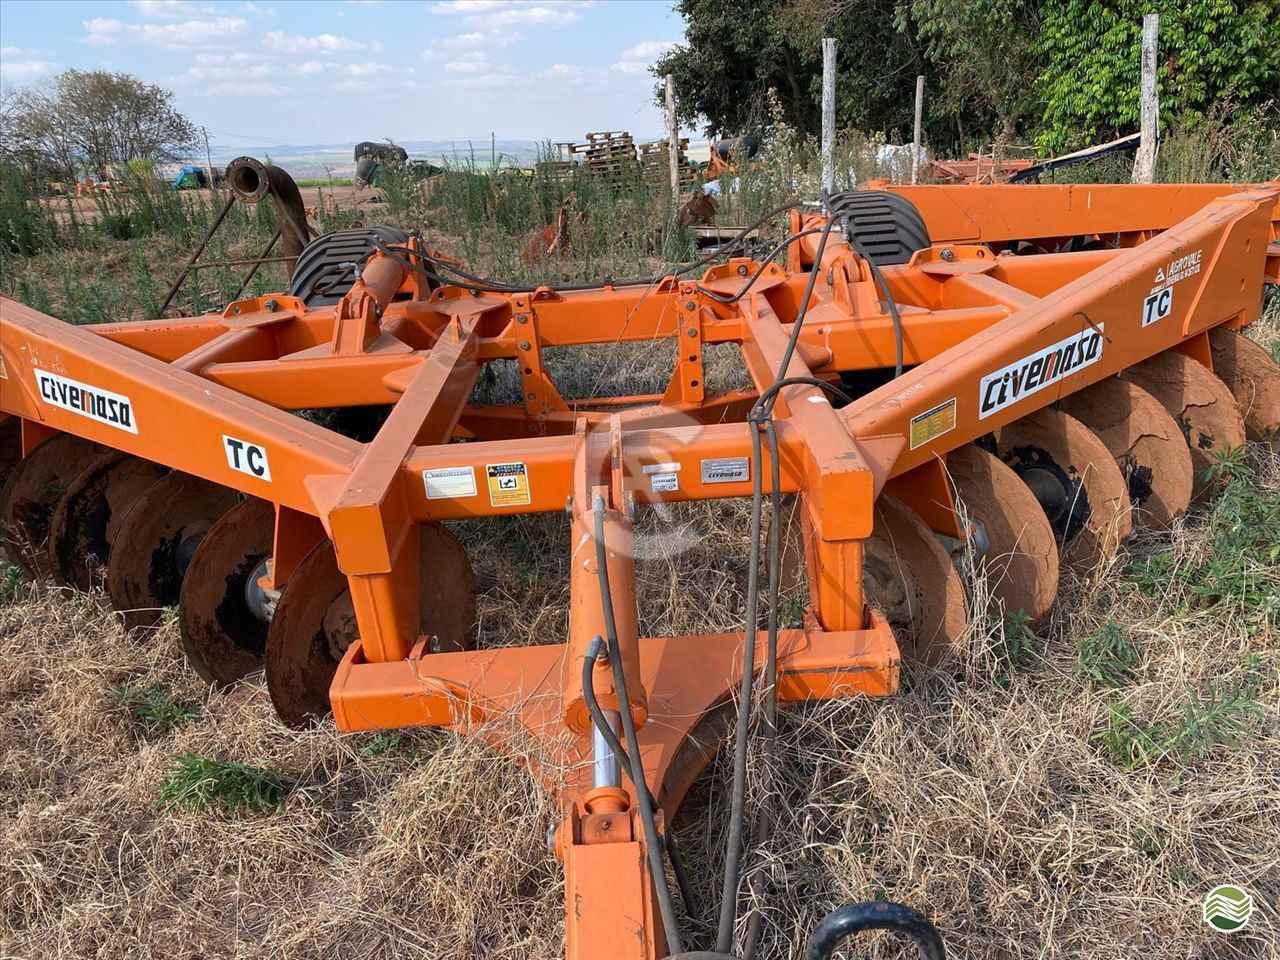 IMPLEMENTOS AGRICOLAS TERRACEADOR 30 DISCOS CR Máquinas Agrícolas CASSILANDIA MATO GROSSO DO SUL MS